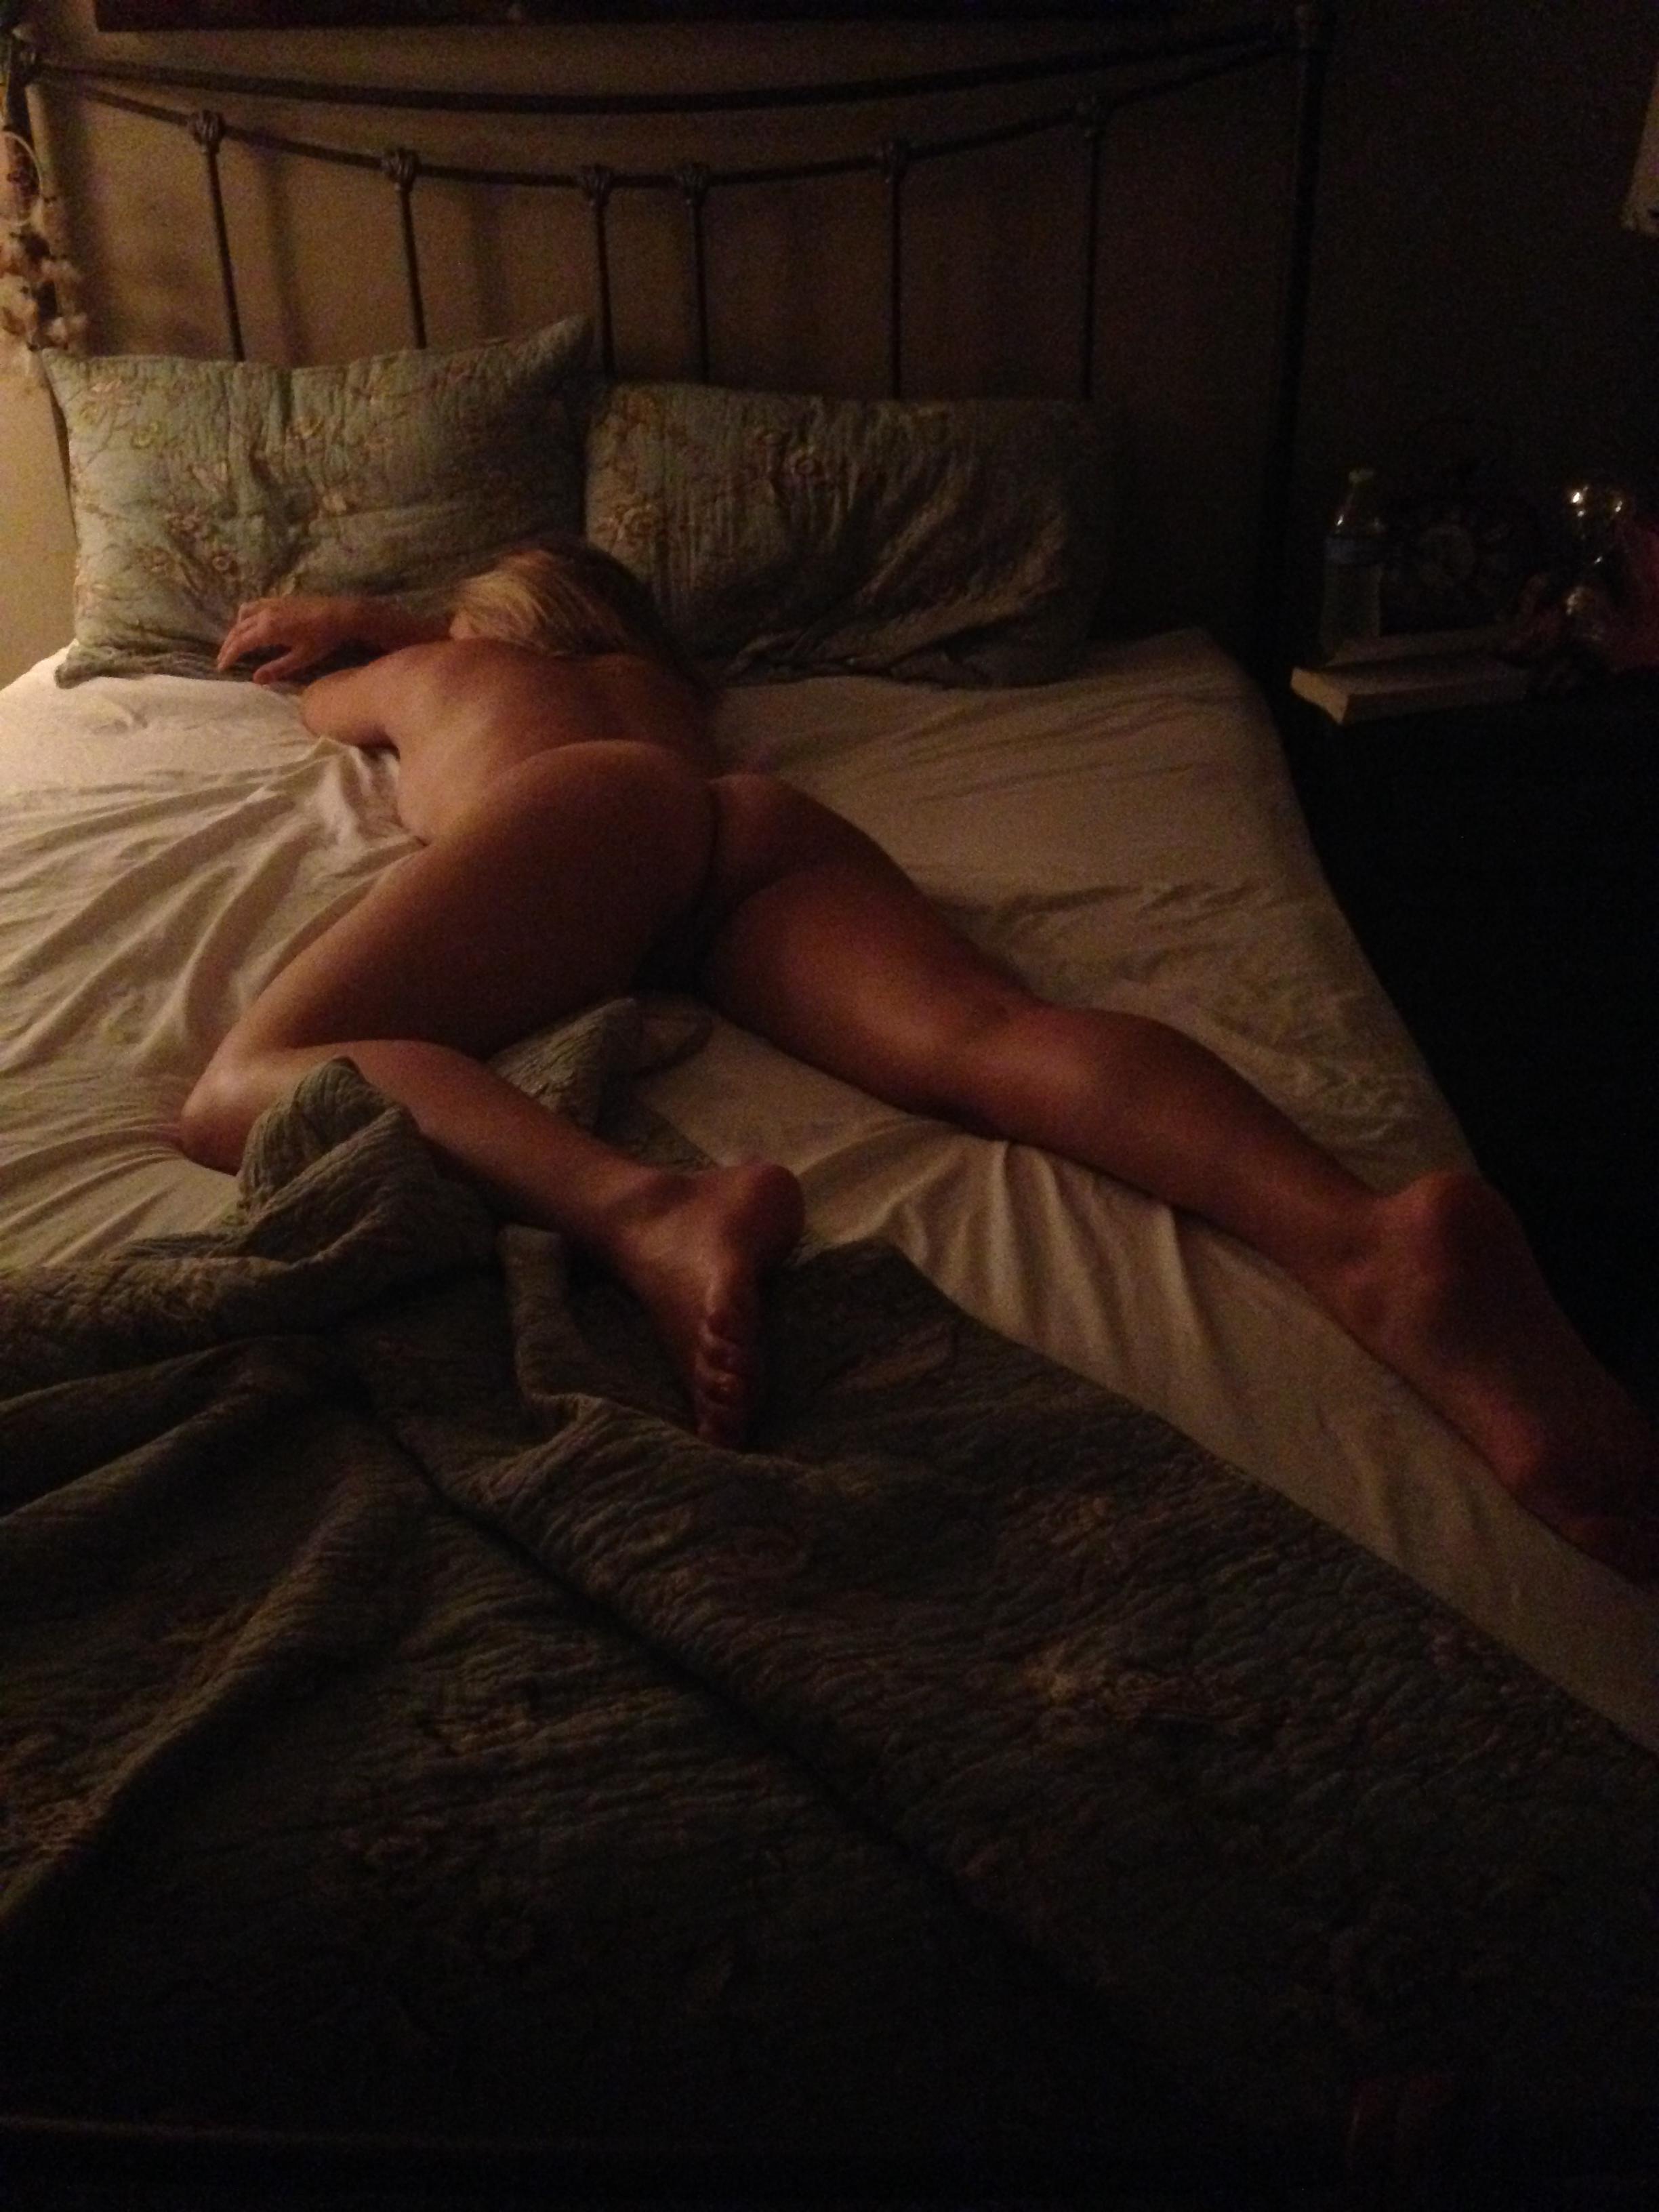 Big Tits Sexy Blonde Schoogirls Naughty Pics  Nude -8815